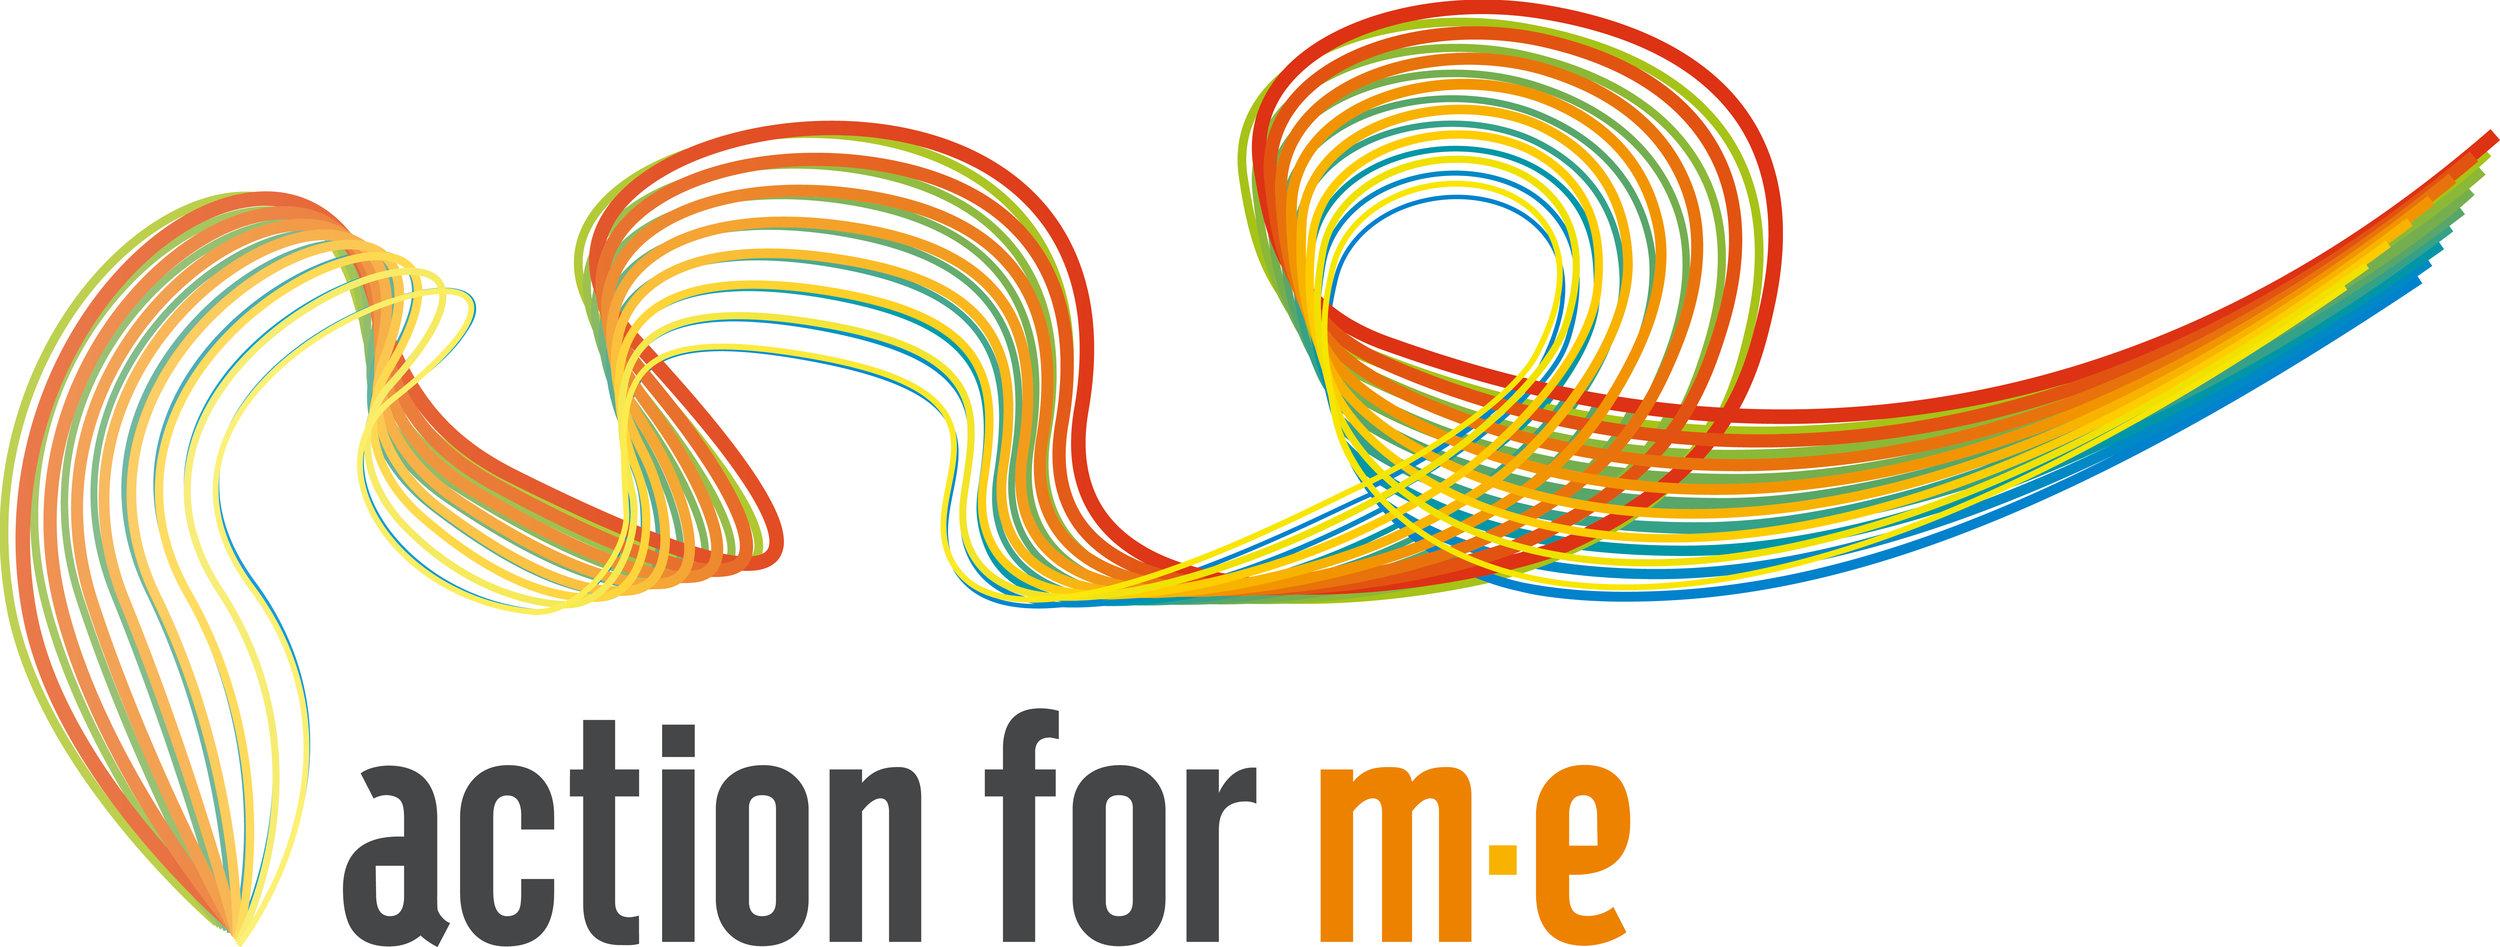 Action for M.E. 300dpi colour logo.jpg